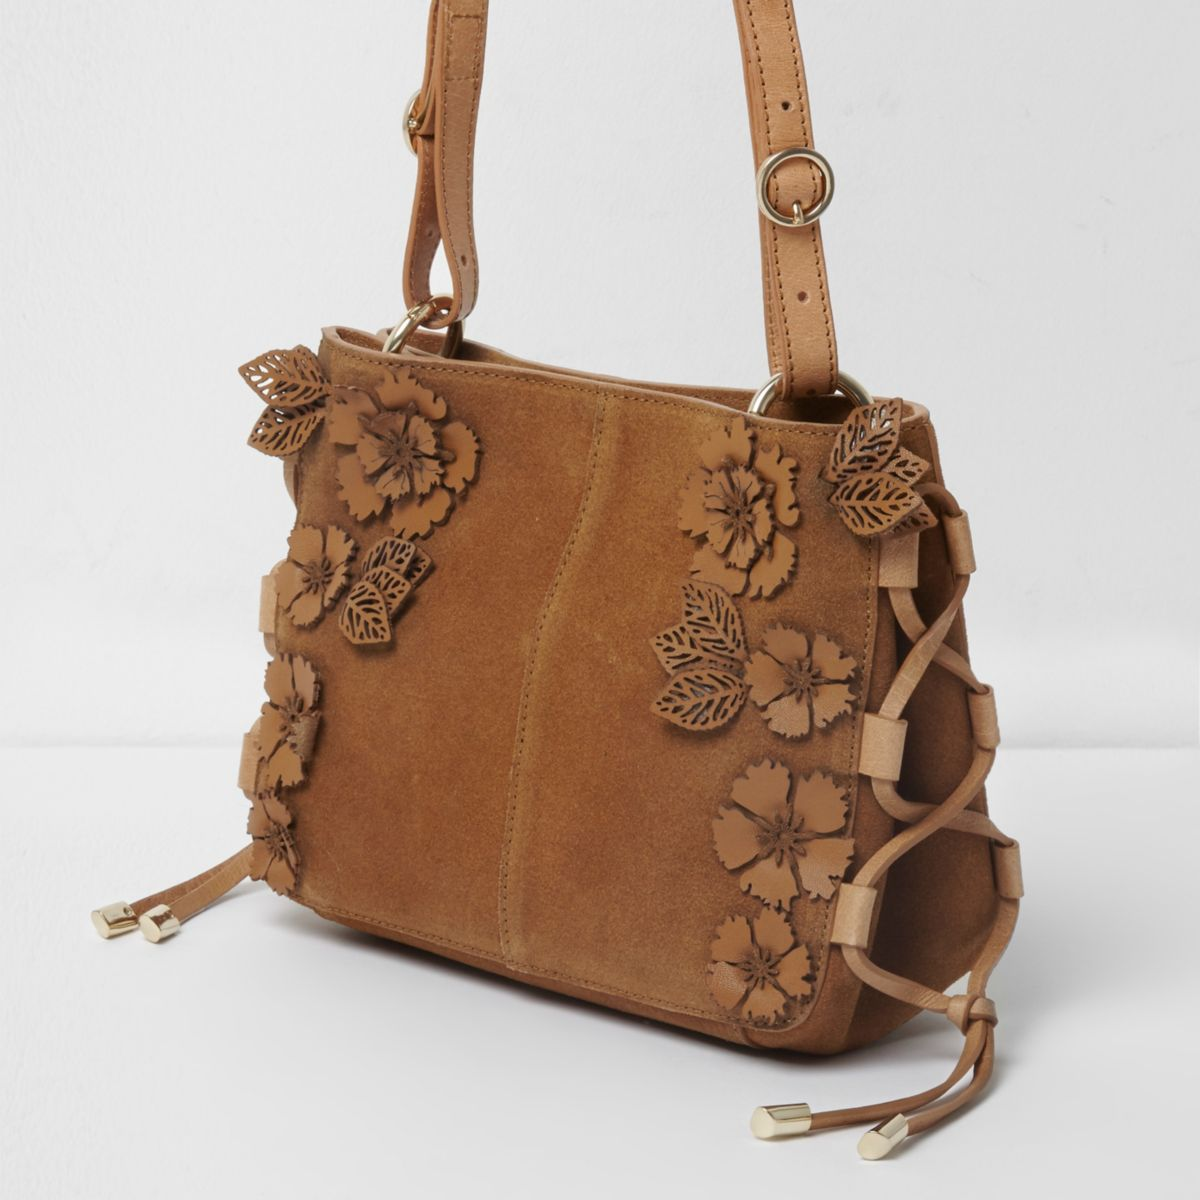 Tan Suede 3D Flower Cross Body Bag - Shoulder Bags - Bags U0026 Purses - Women